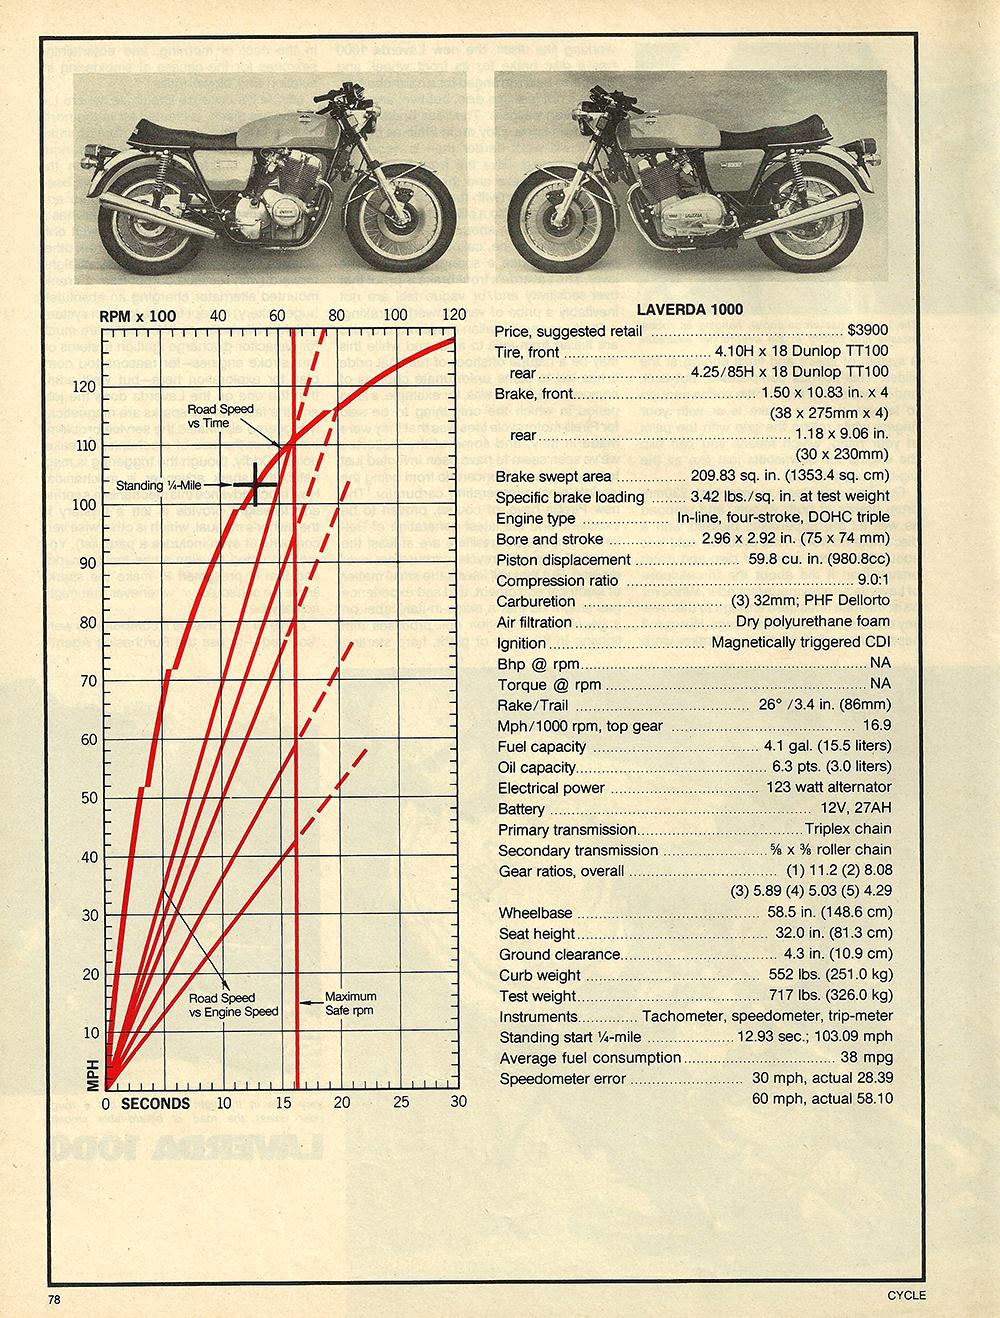 1976 Laverda 1000 road test 4.JPG